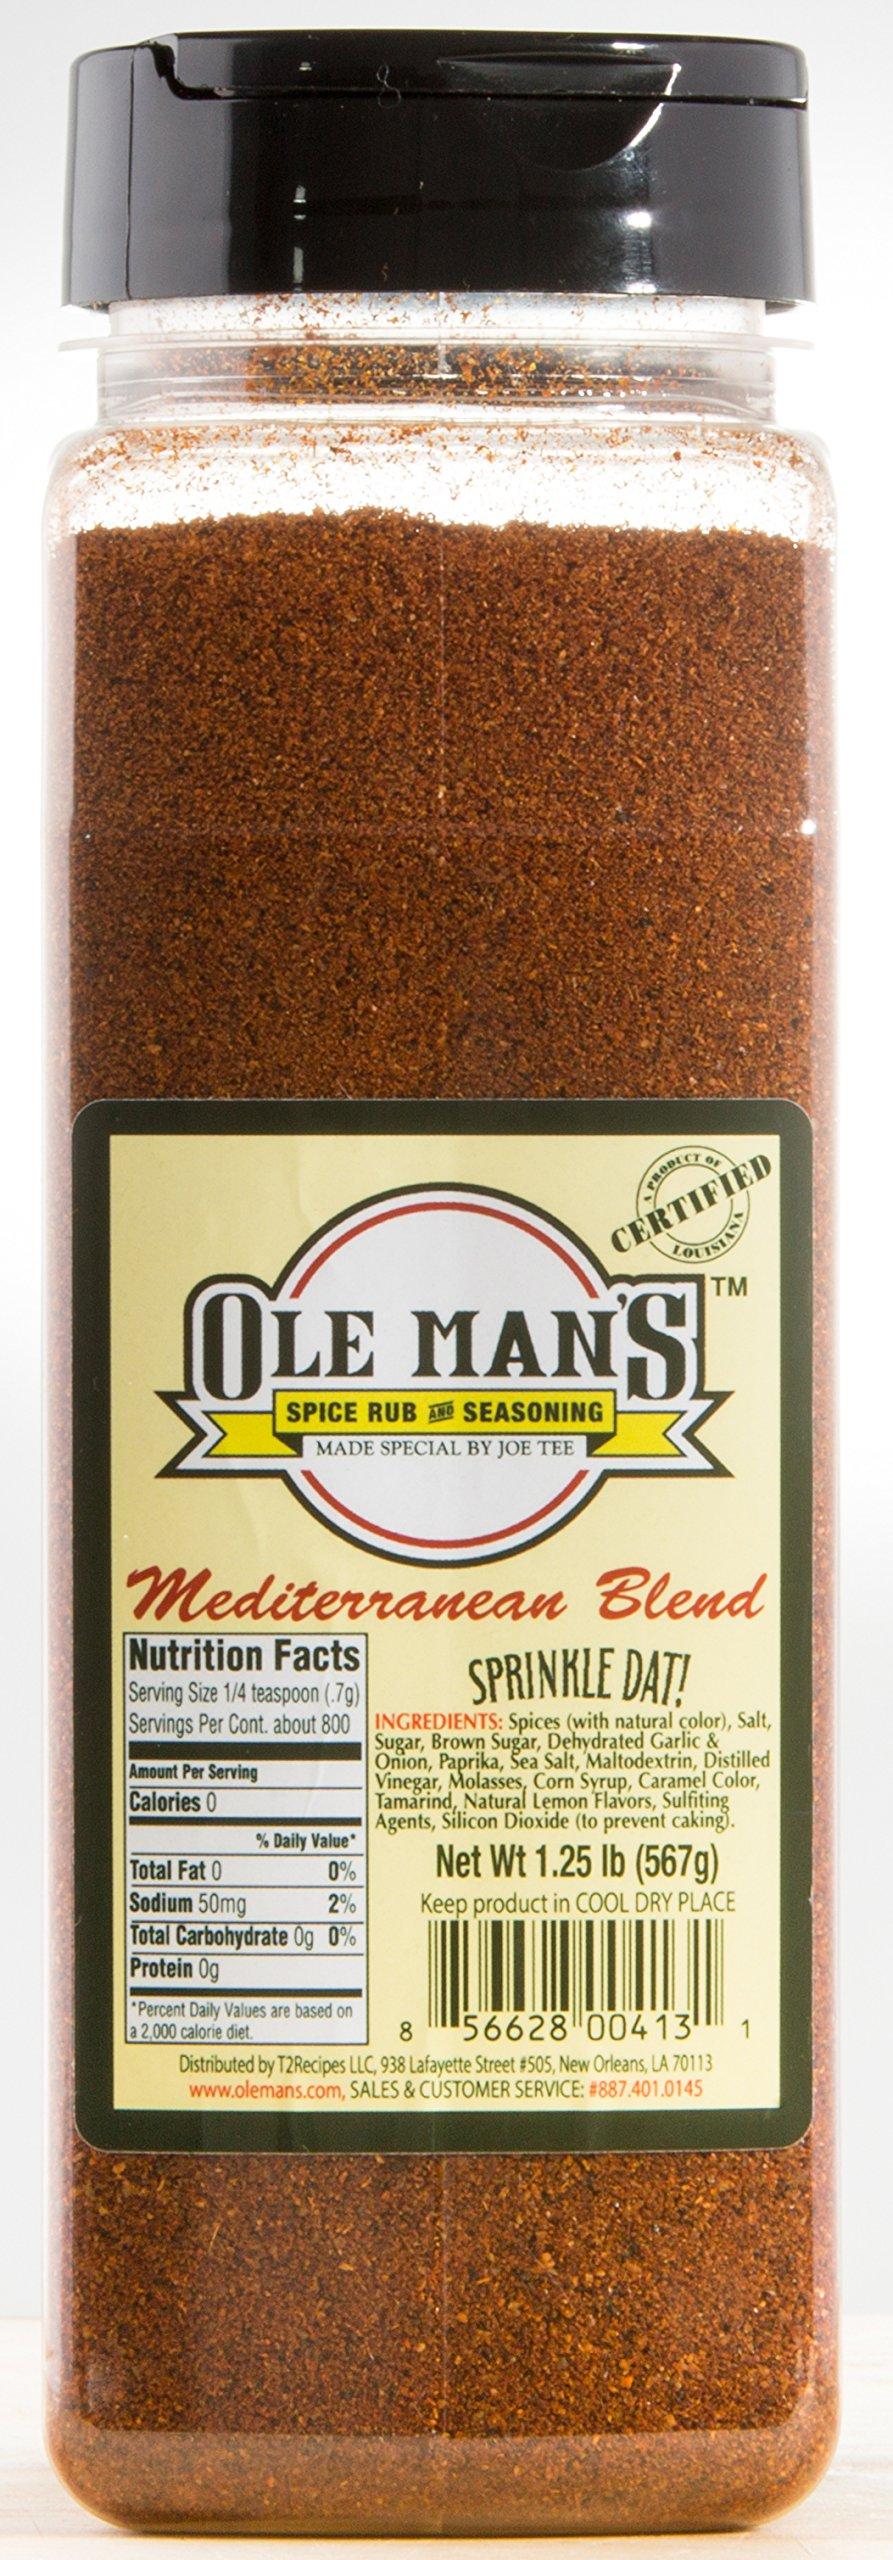 Award Winning! Mediterranean Blend-Ole Man's Spice Rub & Seasoning! Buy 2 Get 1 Free!